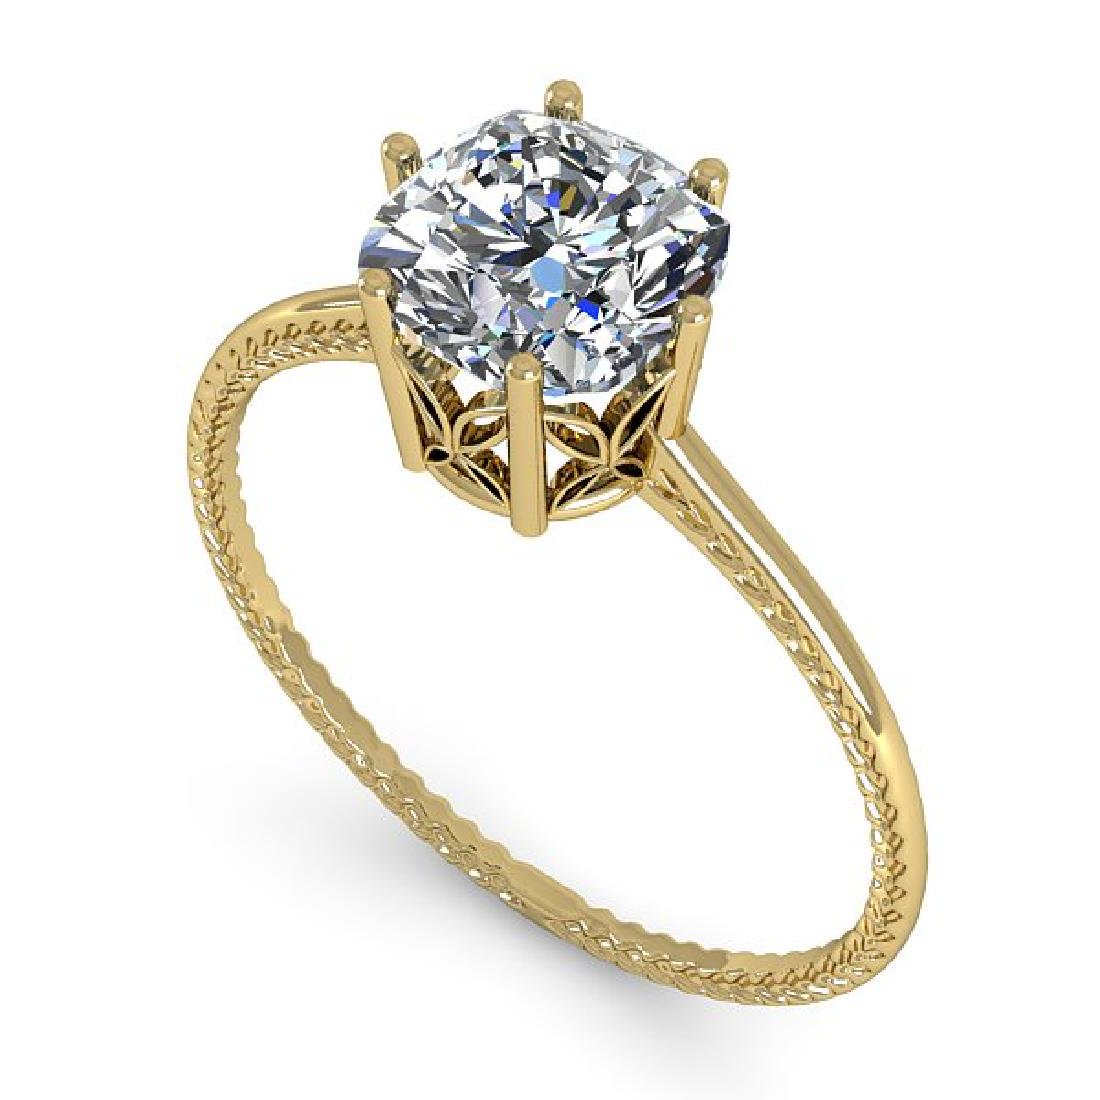 1.0 CTW VS/SI Cushion Diamond Art Deco Ring 14K Yellow - 2